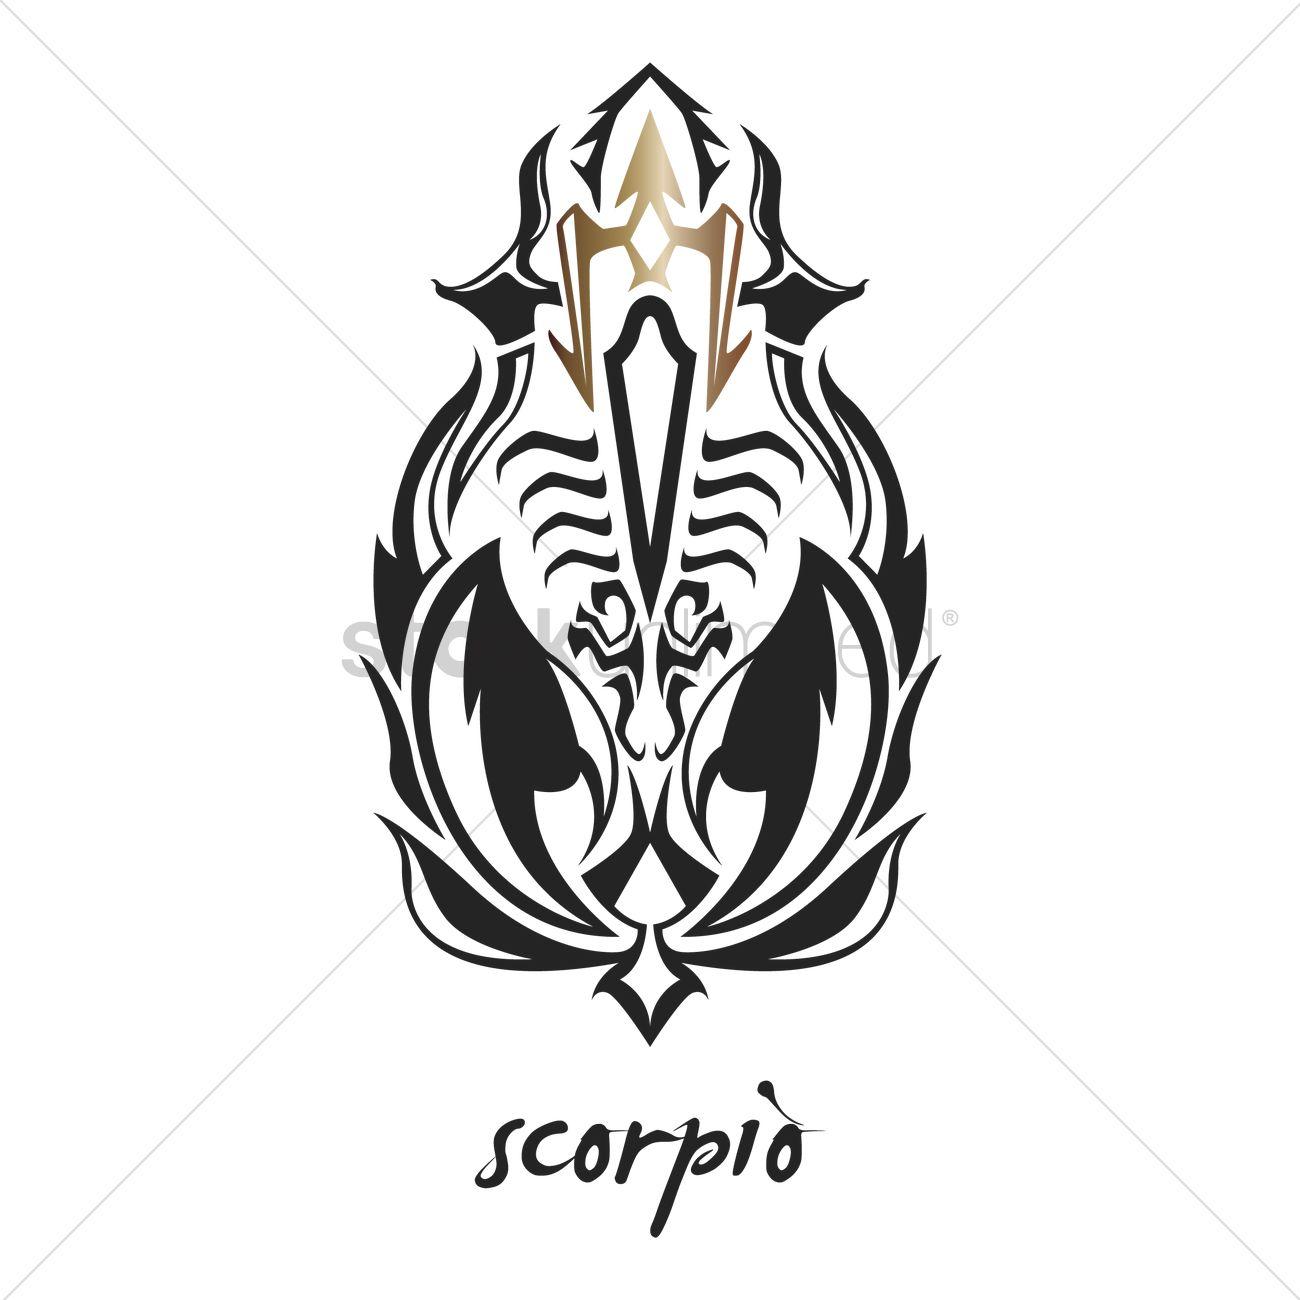 Scorpio Tattoo Horoscope Design Vector Image 1969168 Stockunlimited